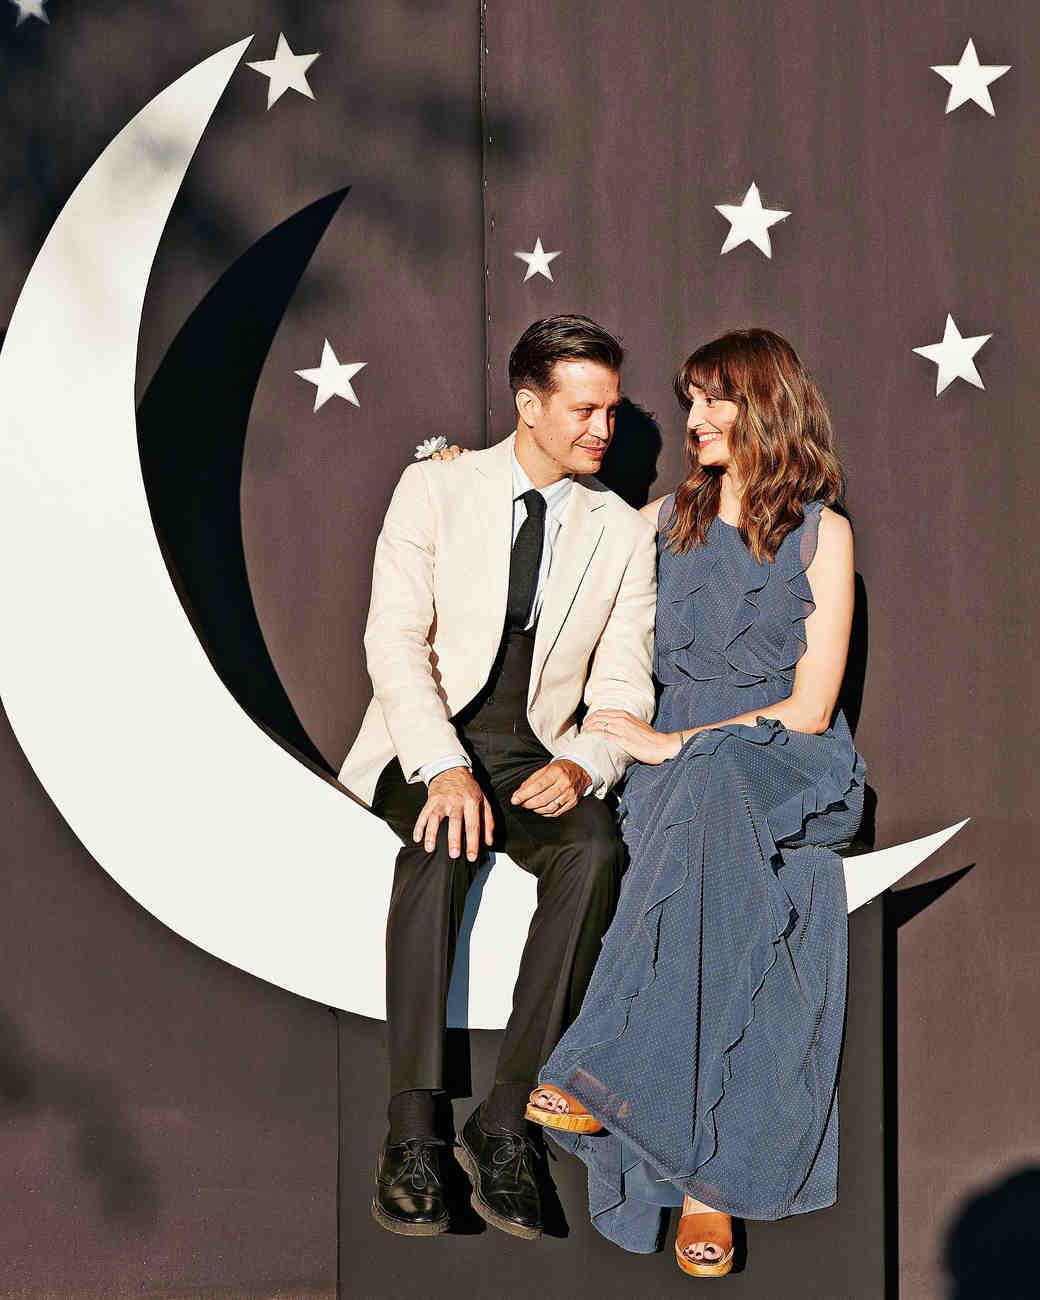 avril quy wedding new york celestial photo booth moon stars